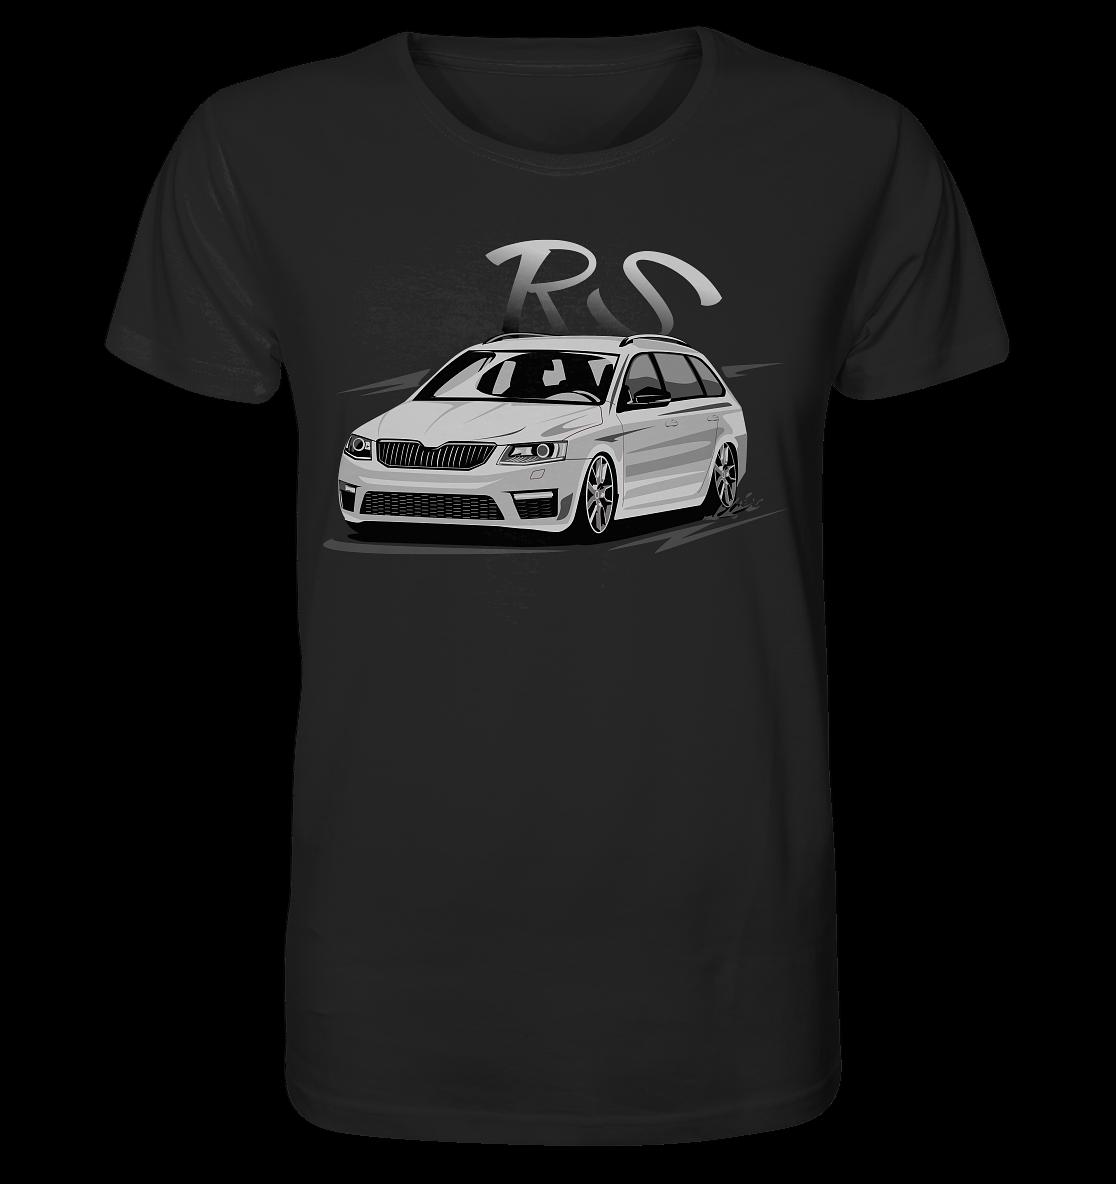 T-shirt Homme Skoda Octavia Combi 3 Rs